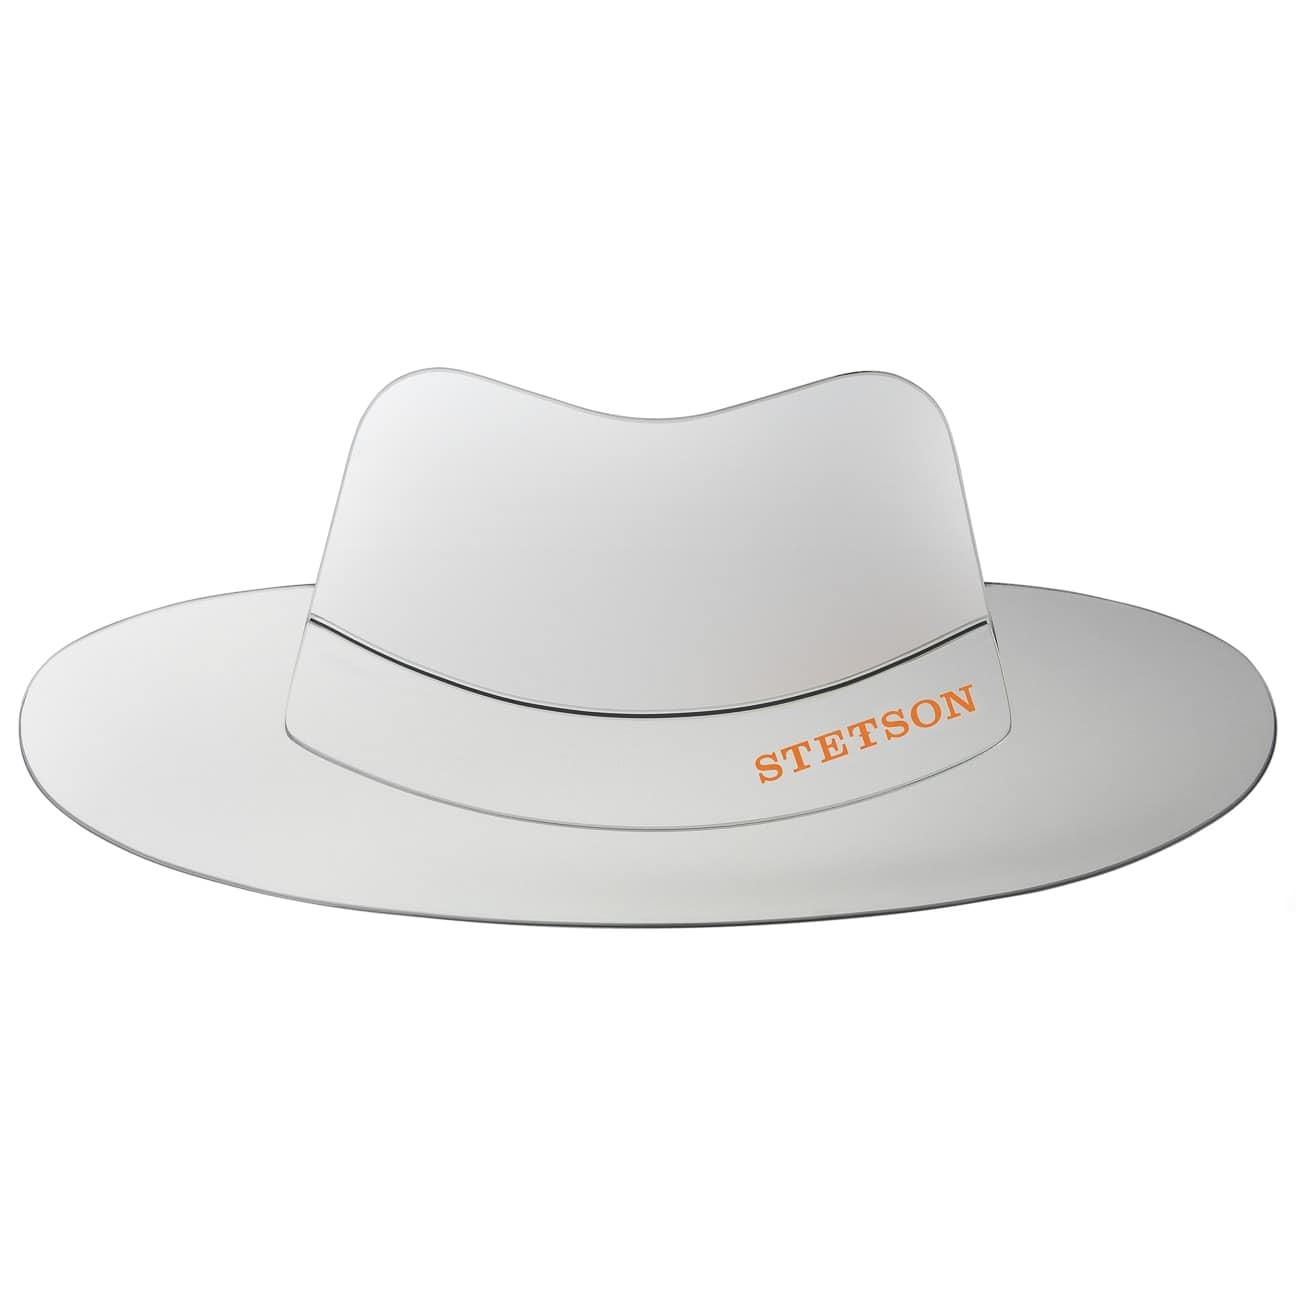 Miroir hat shape by stetson 49 95 for Miroir vagabond